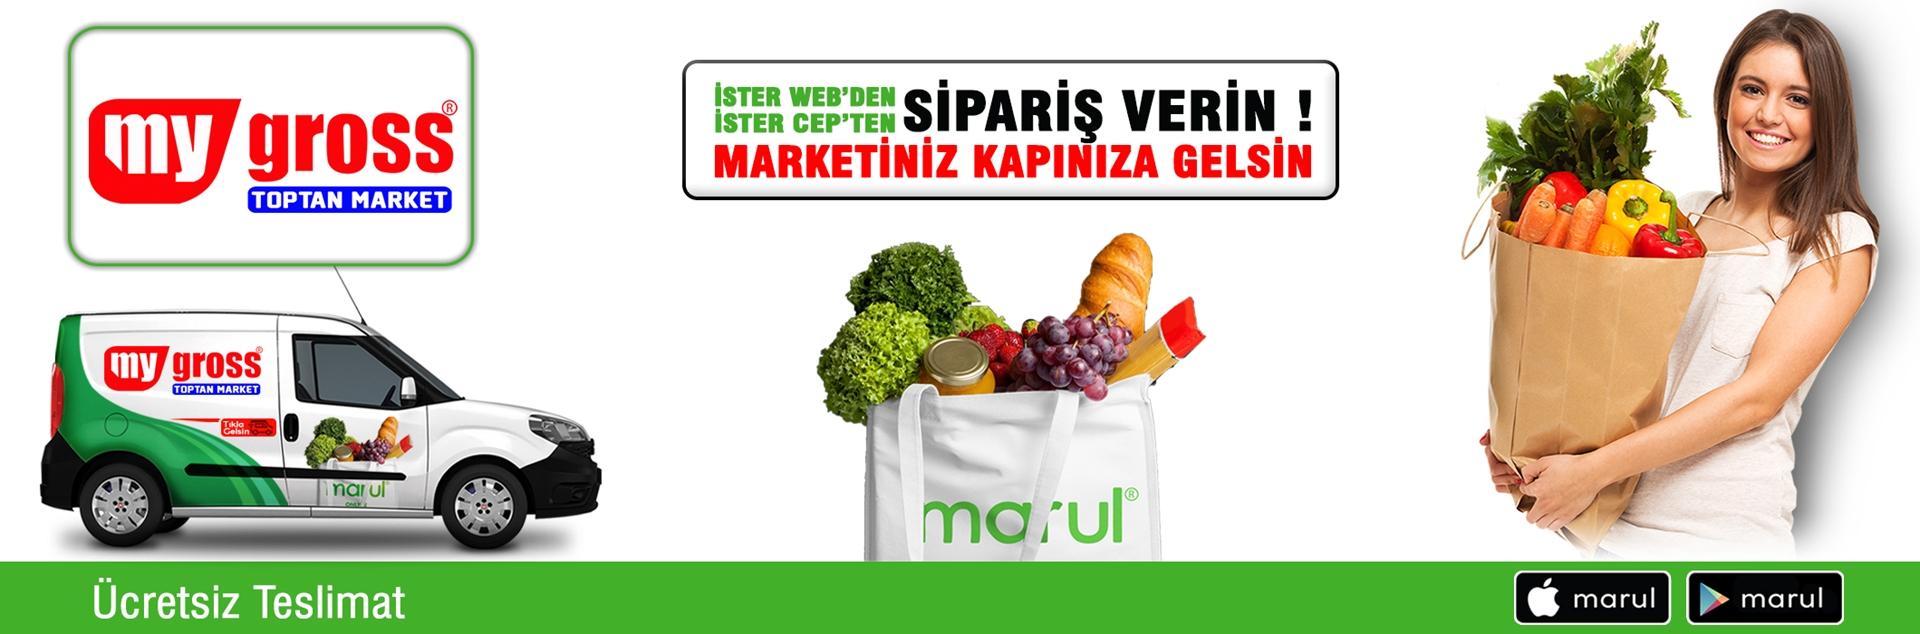 konya karatay my gross toptan market online market alışverişi